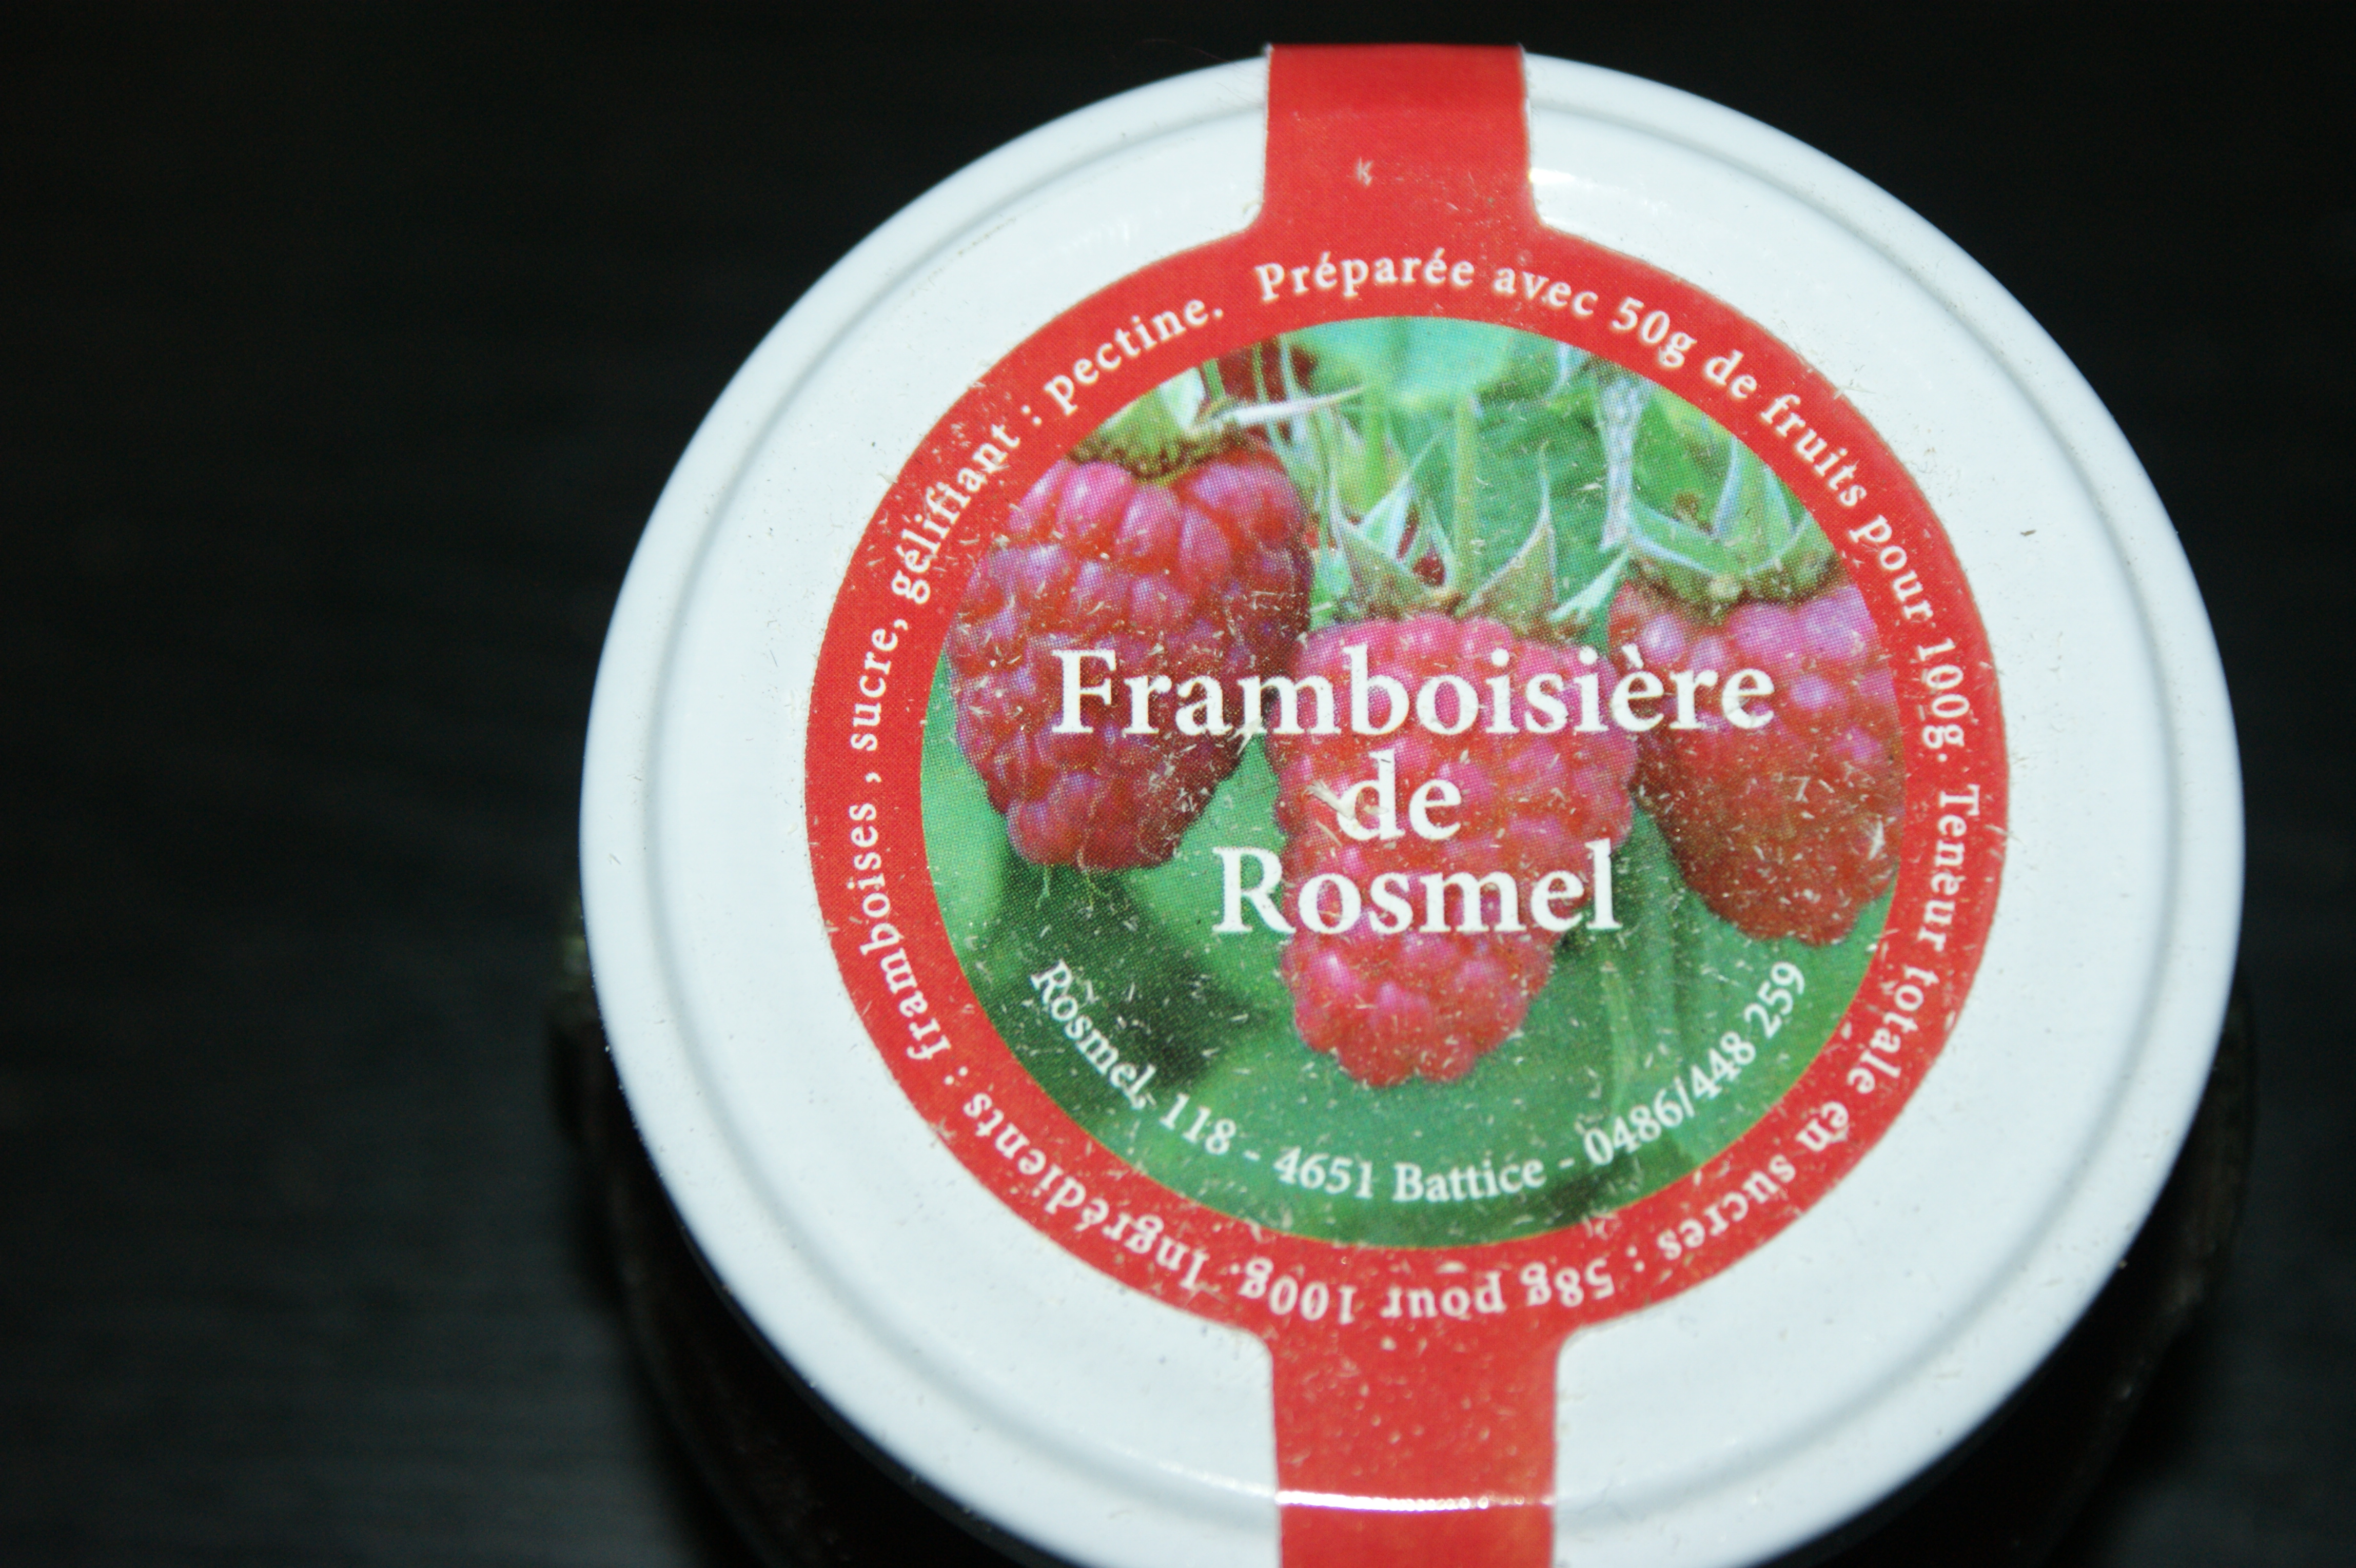 La Framboisière de Rosmel